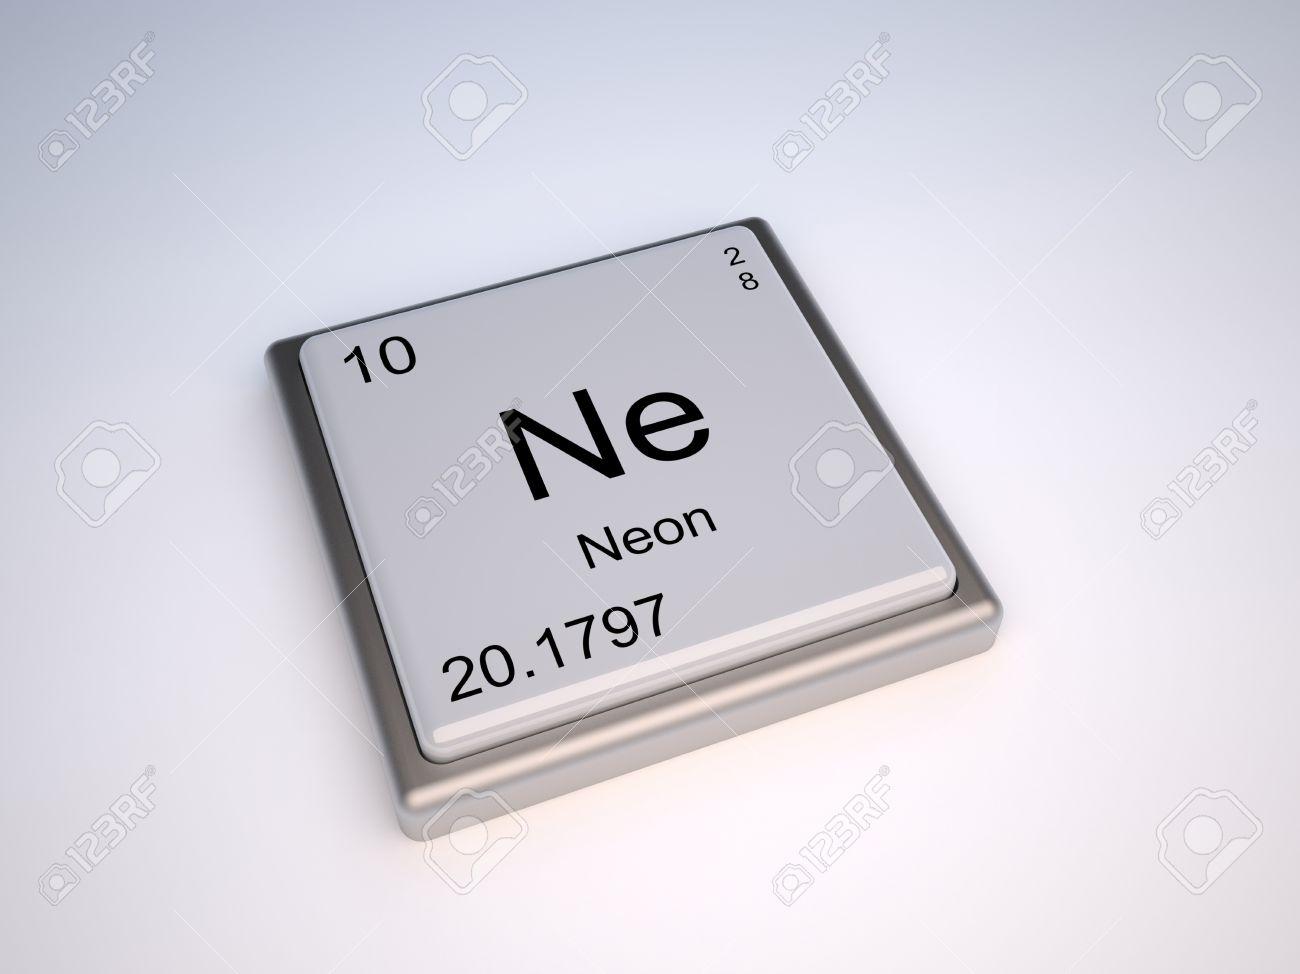 010 elemento qumico de nen de la tabla peridica con smbolo ne 010 elemento qumico de nen de la tabla peridica con smbolo ne iupac foto de urtaz Images